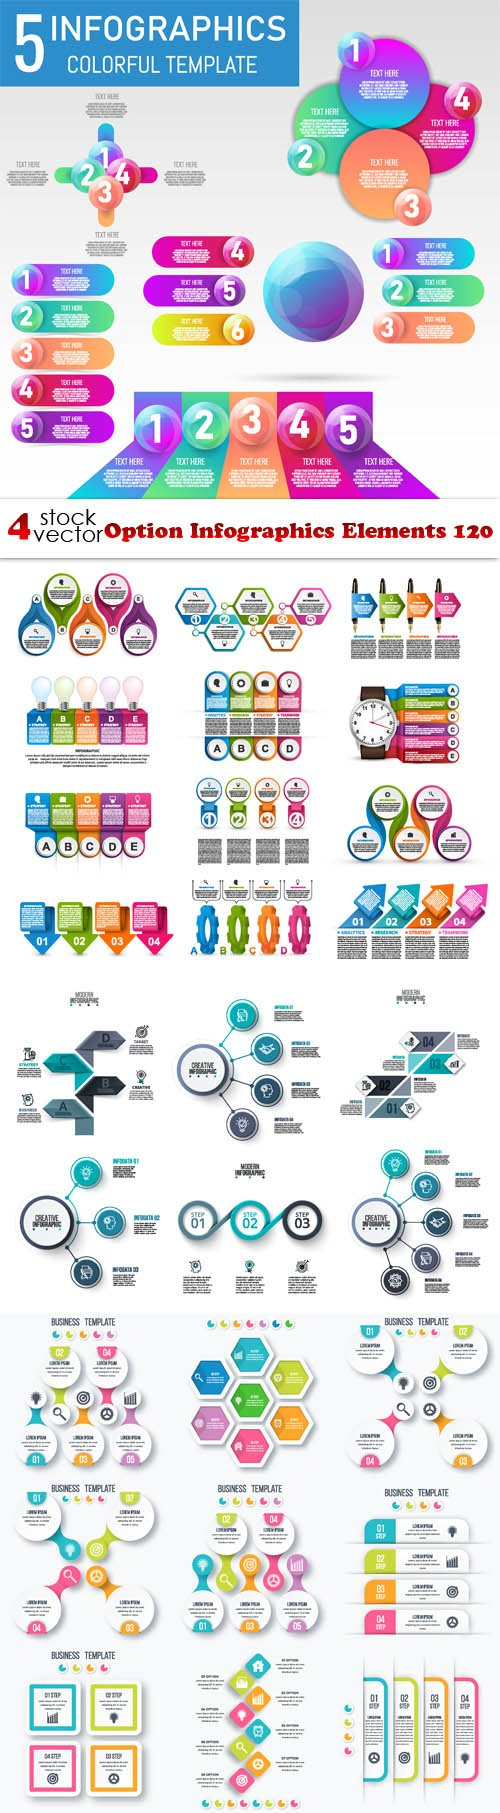 Vectors - Option Infographics Elements 120